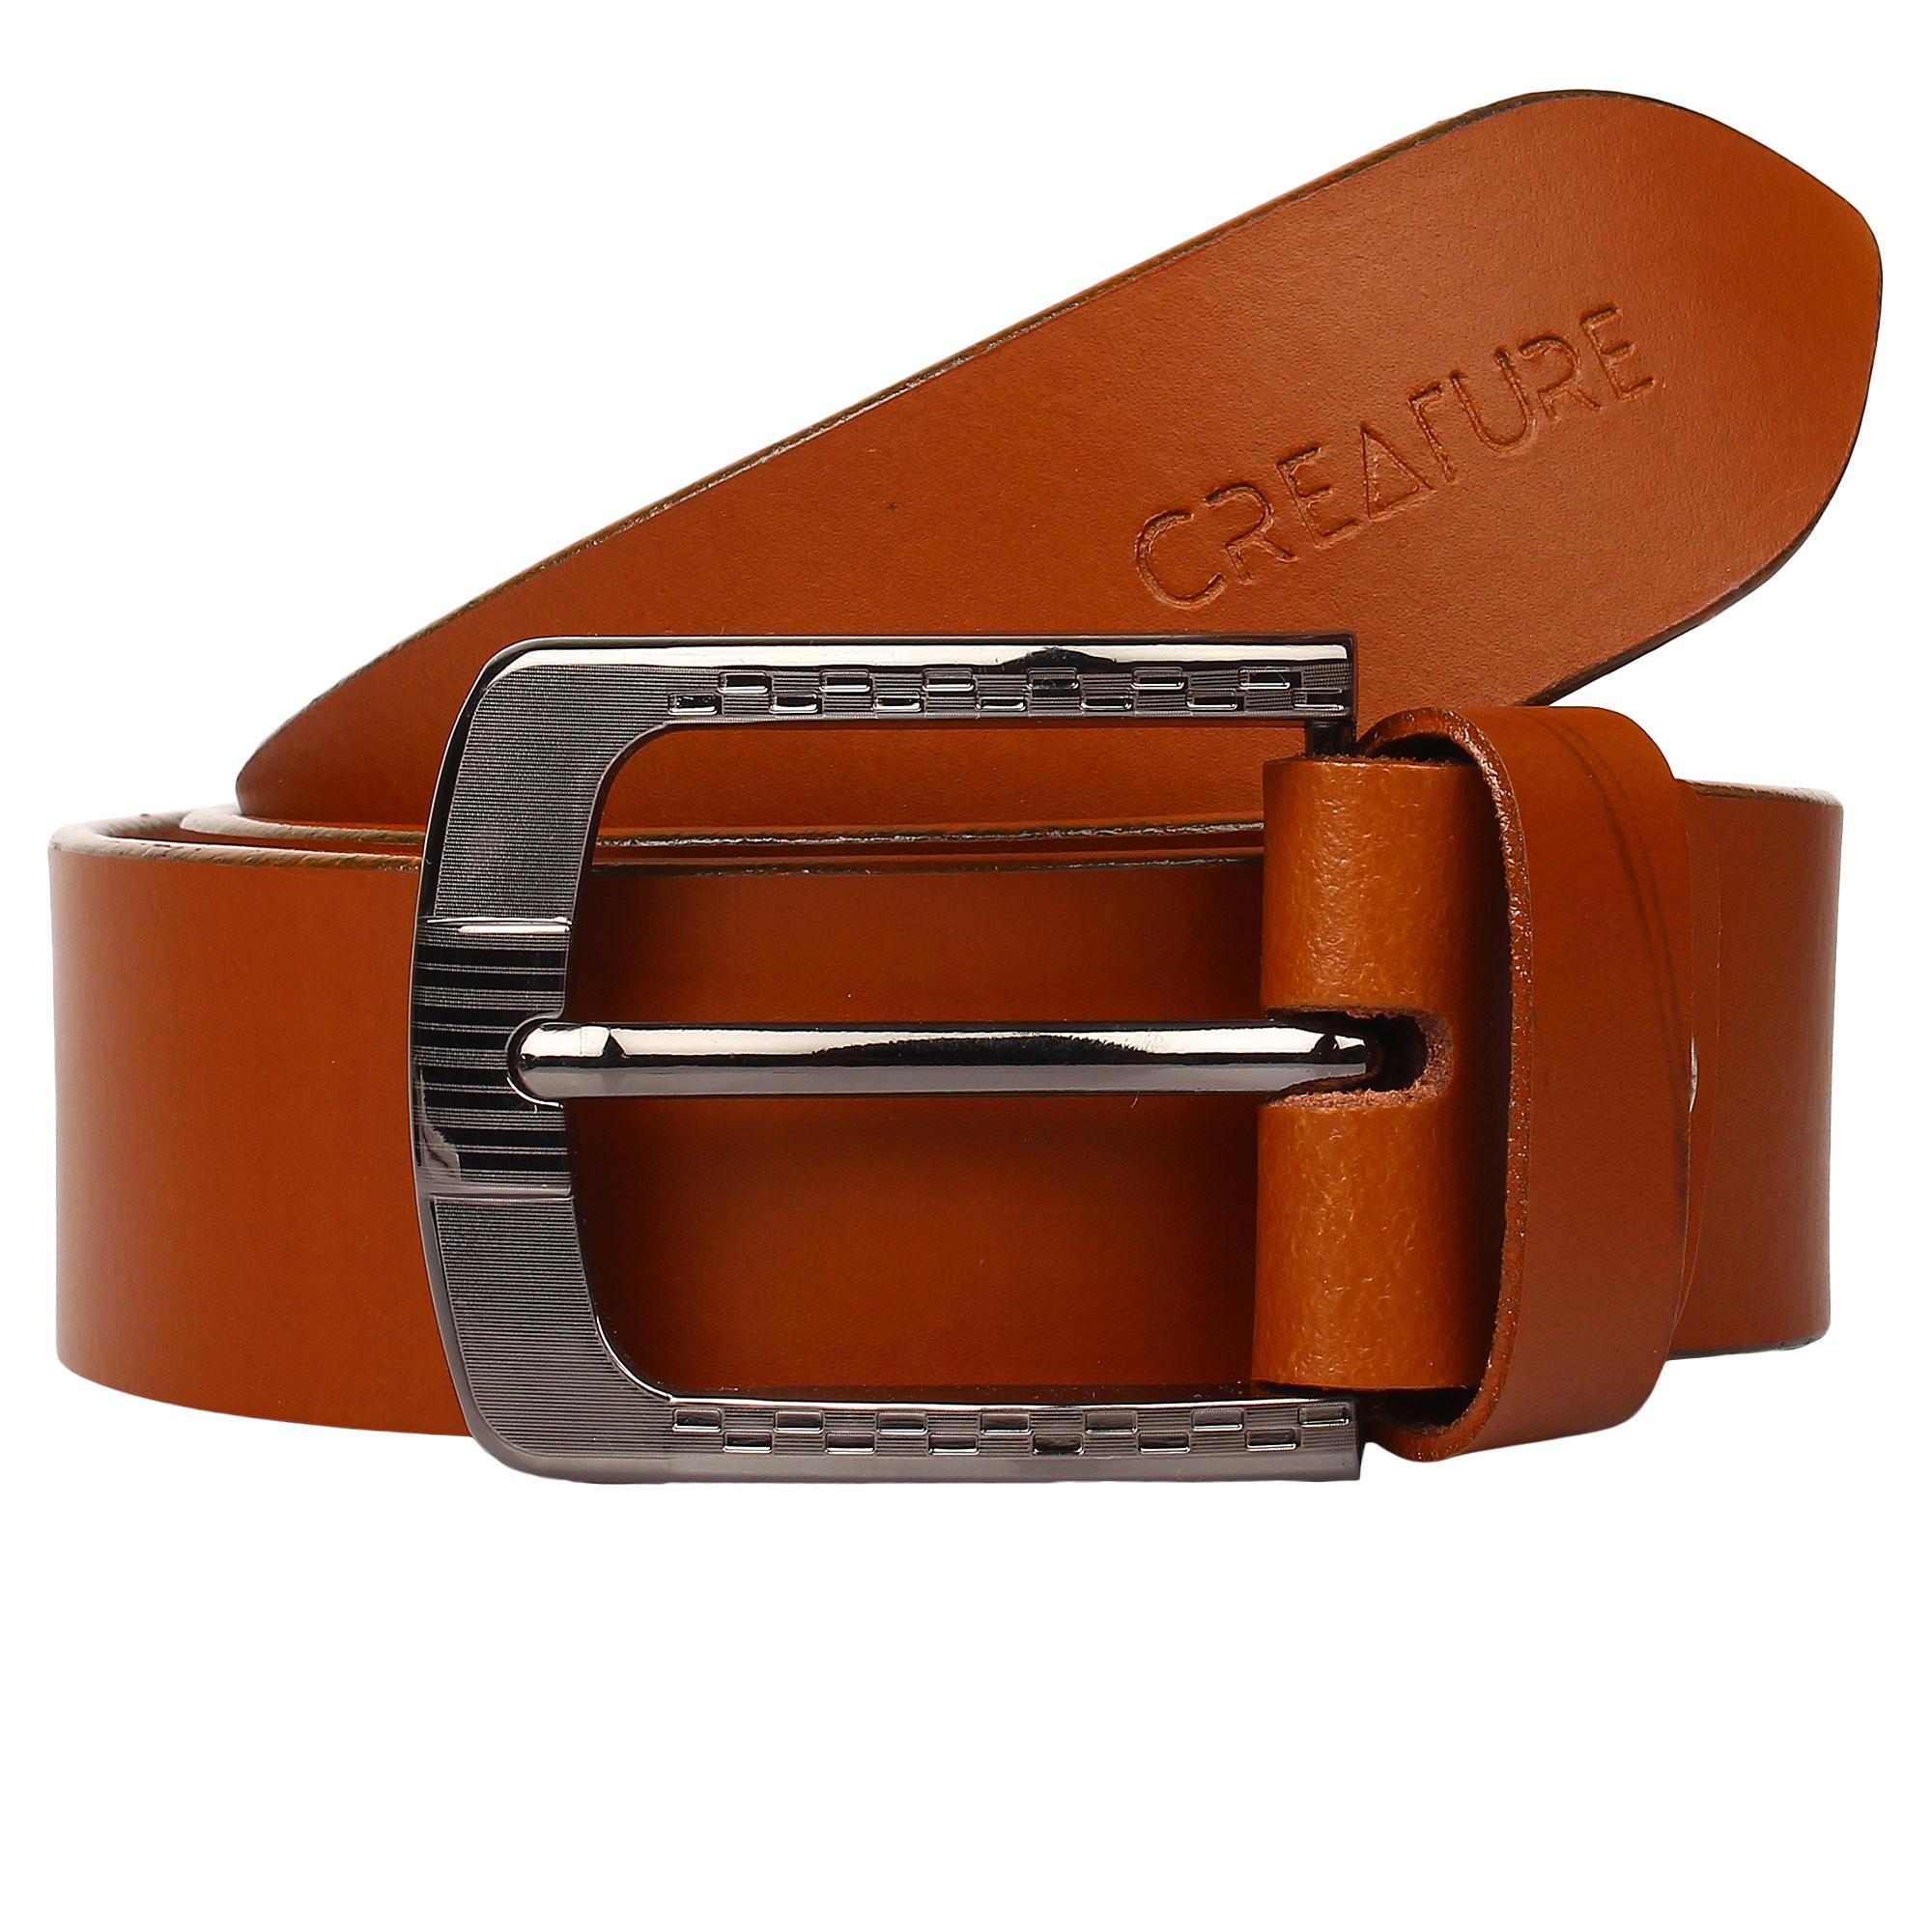 CREATURE | CREATURE Formal/Casual Tan Colour Genuine Leather Tan Belt for Men